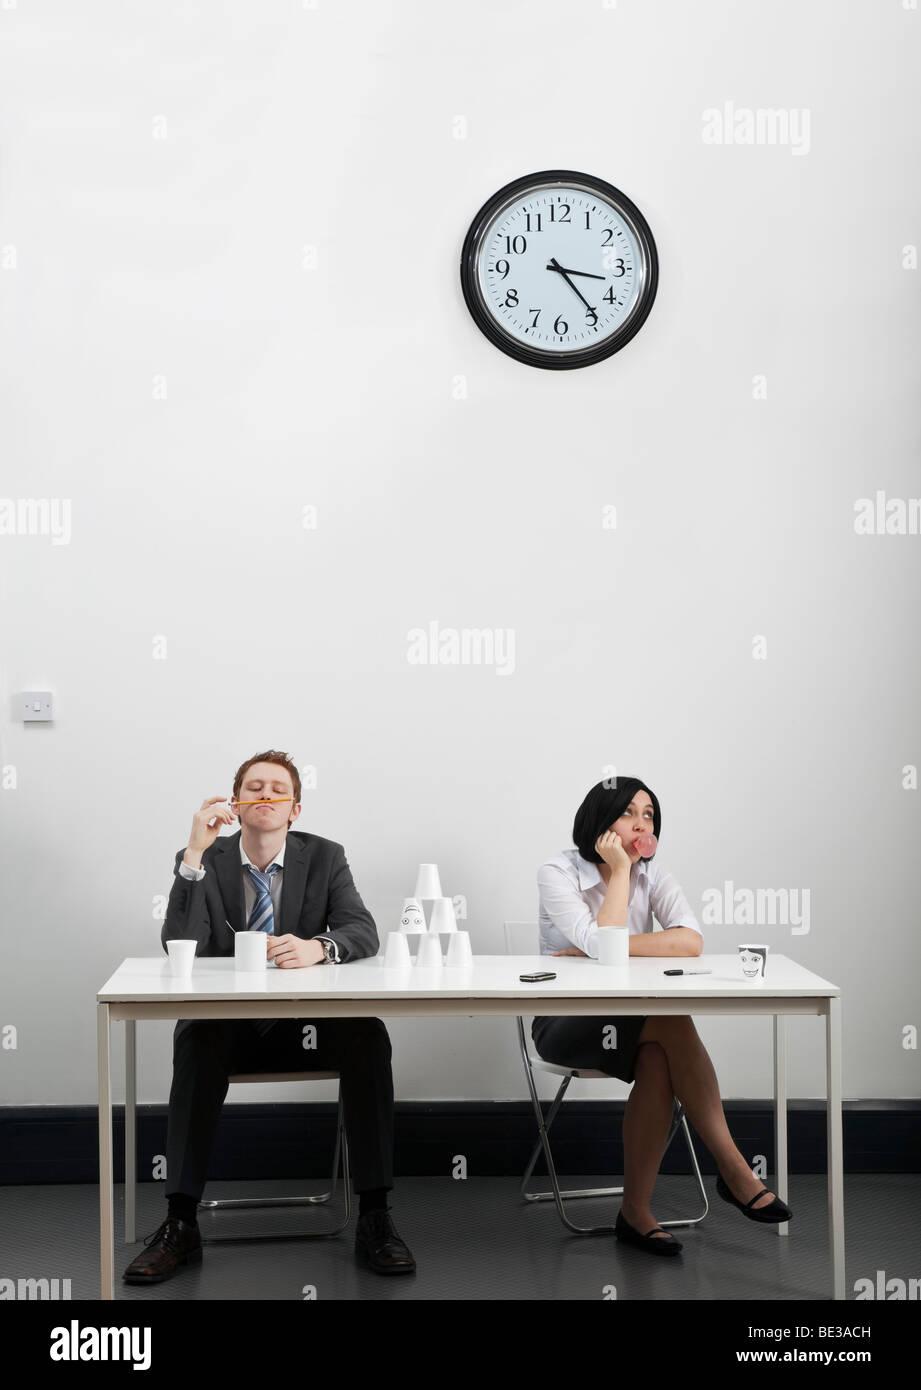 Bored employees on coffee break - Stock Image